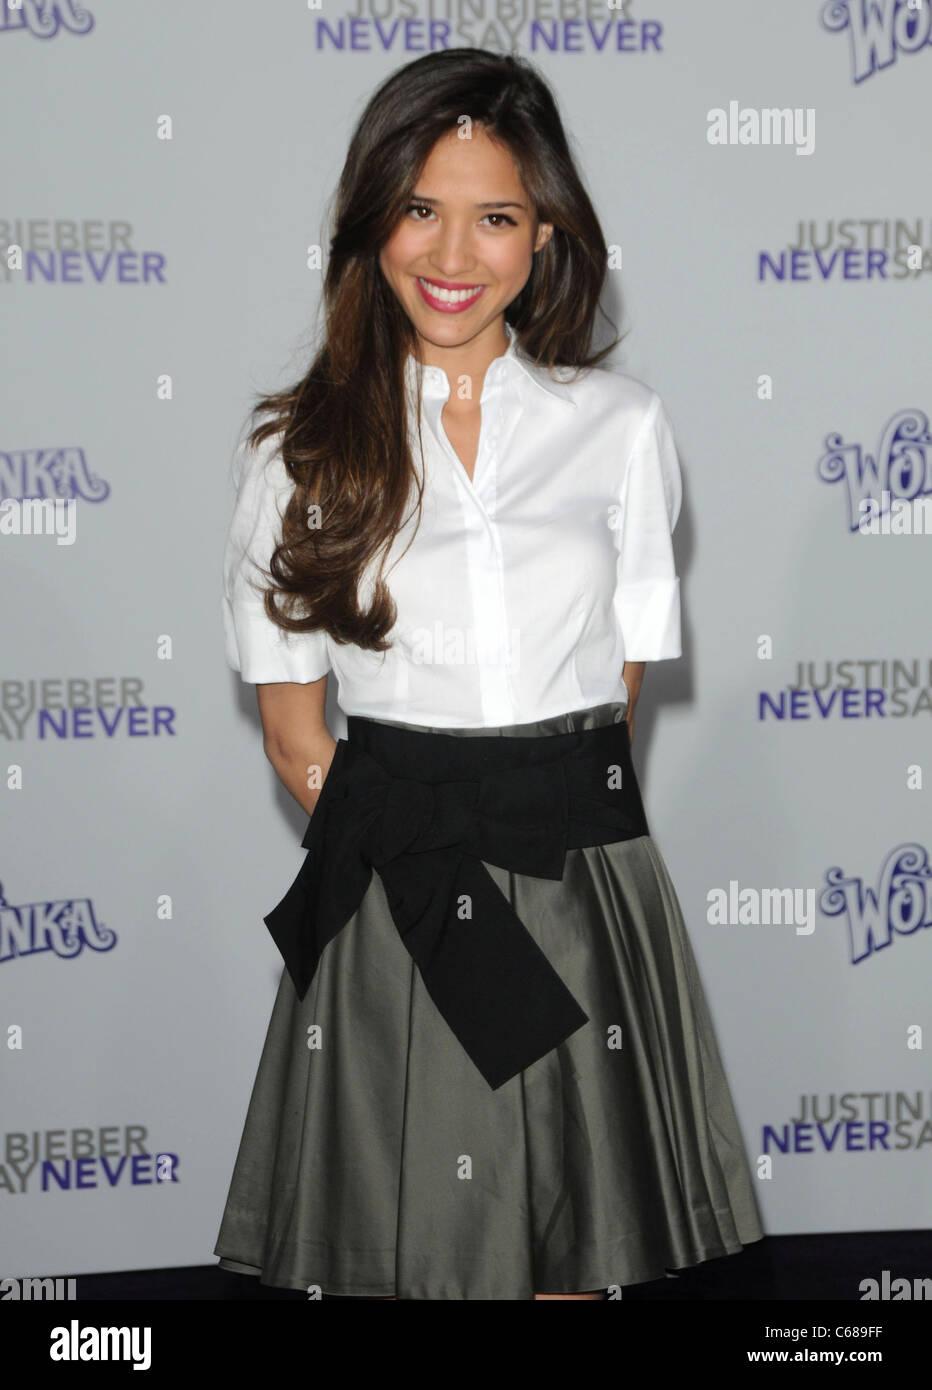 Kelsey Chow Justin Bieber Stock Photos & Kelsey Chow ...